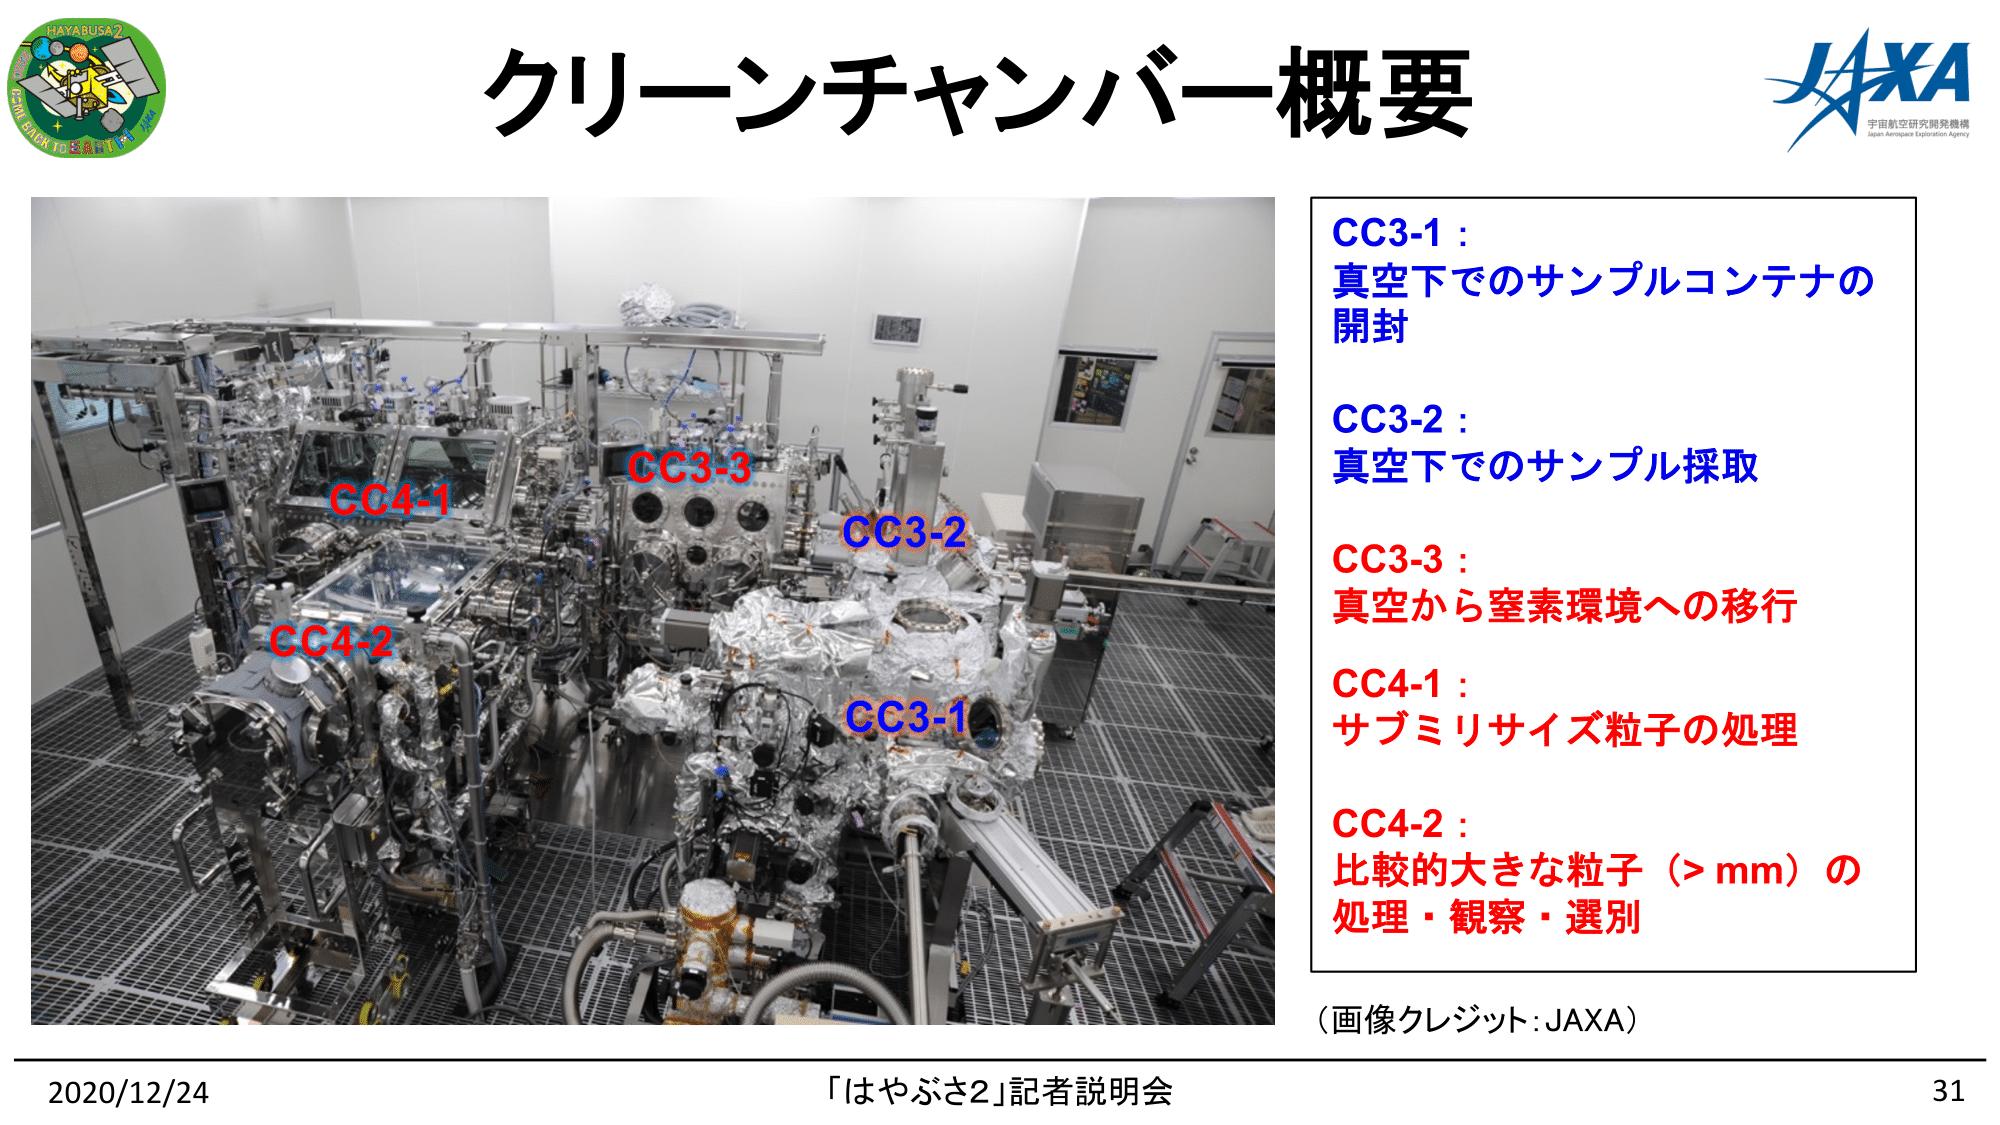 f:id:Imamura:20201224135333p:plain